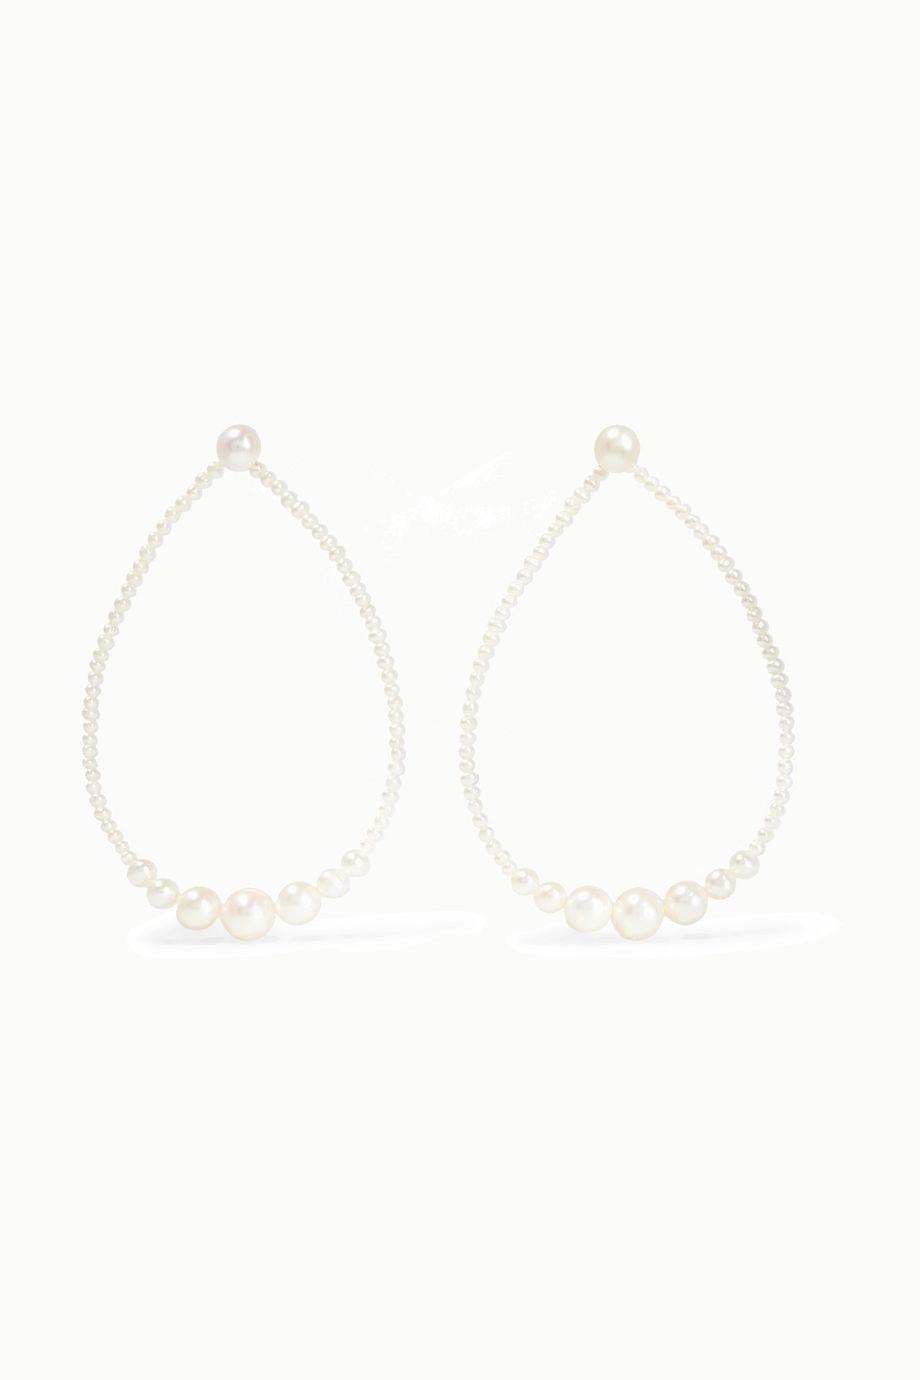 Saskia Diez Gold pearl earrings